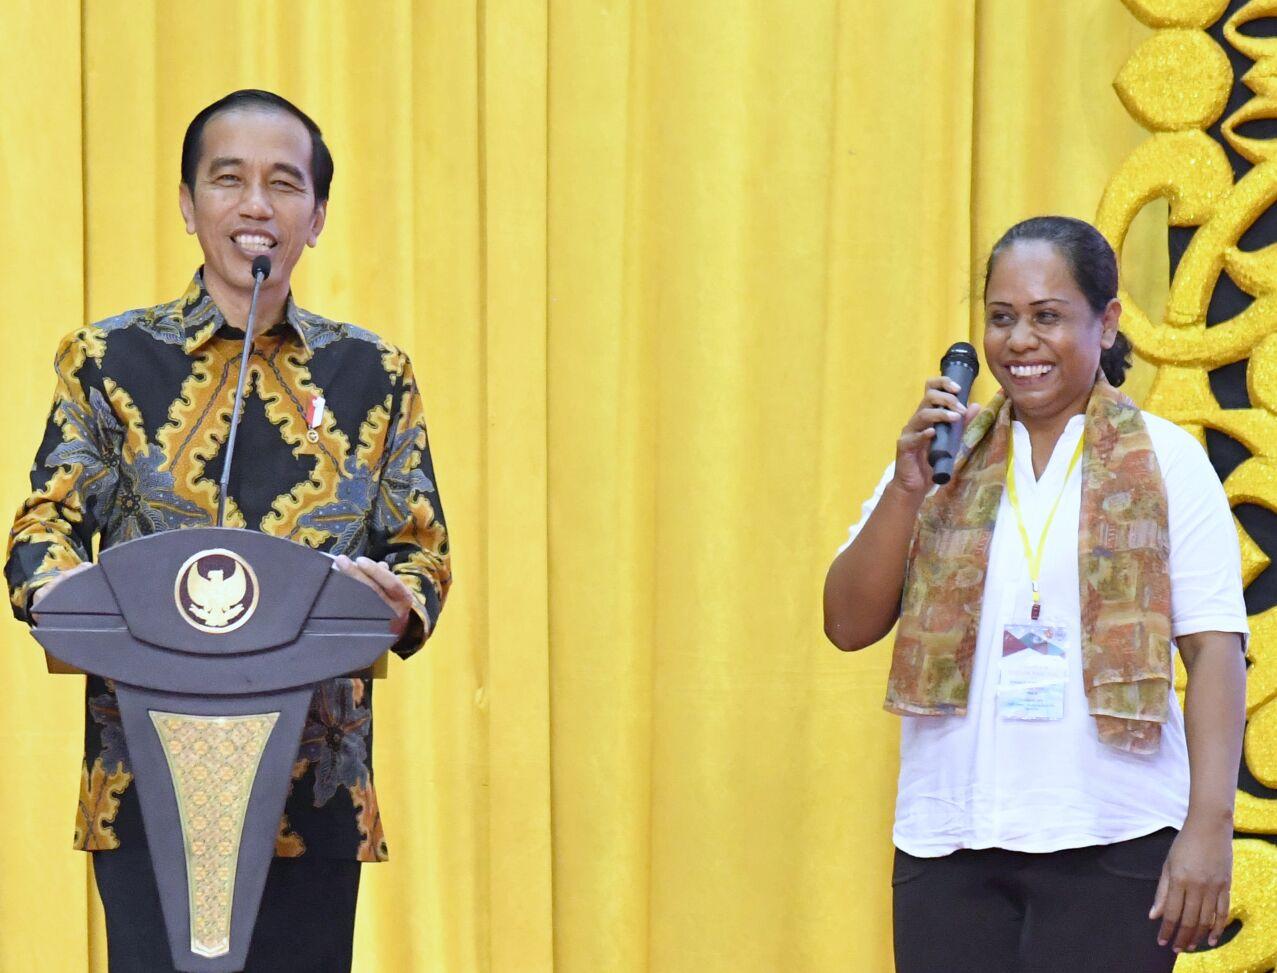 Presiden Jokowi Tegaskan Infrastruktur Salah Satu Alat Pemersatu Bangsa Info Seputar Presiden